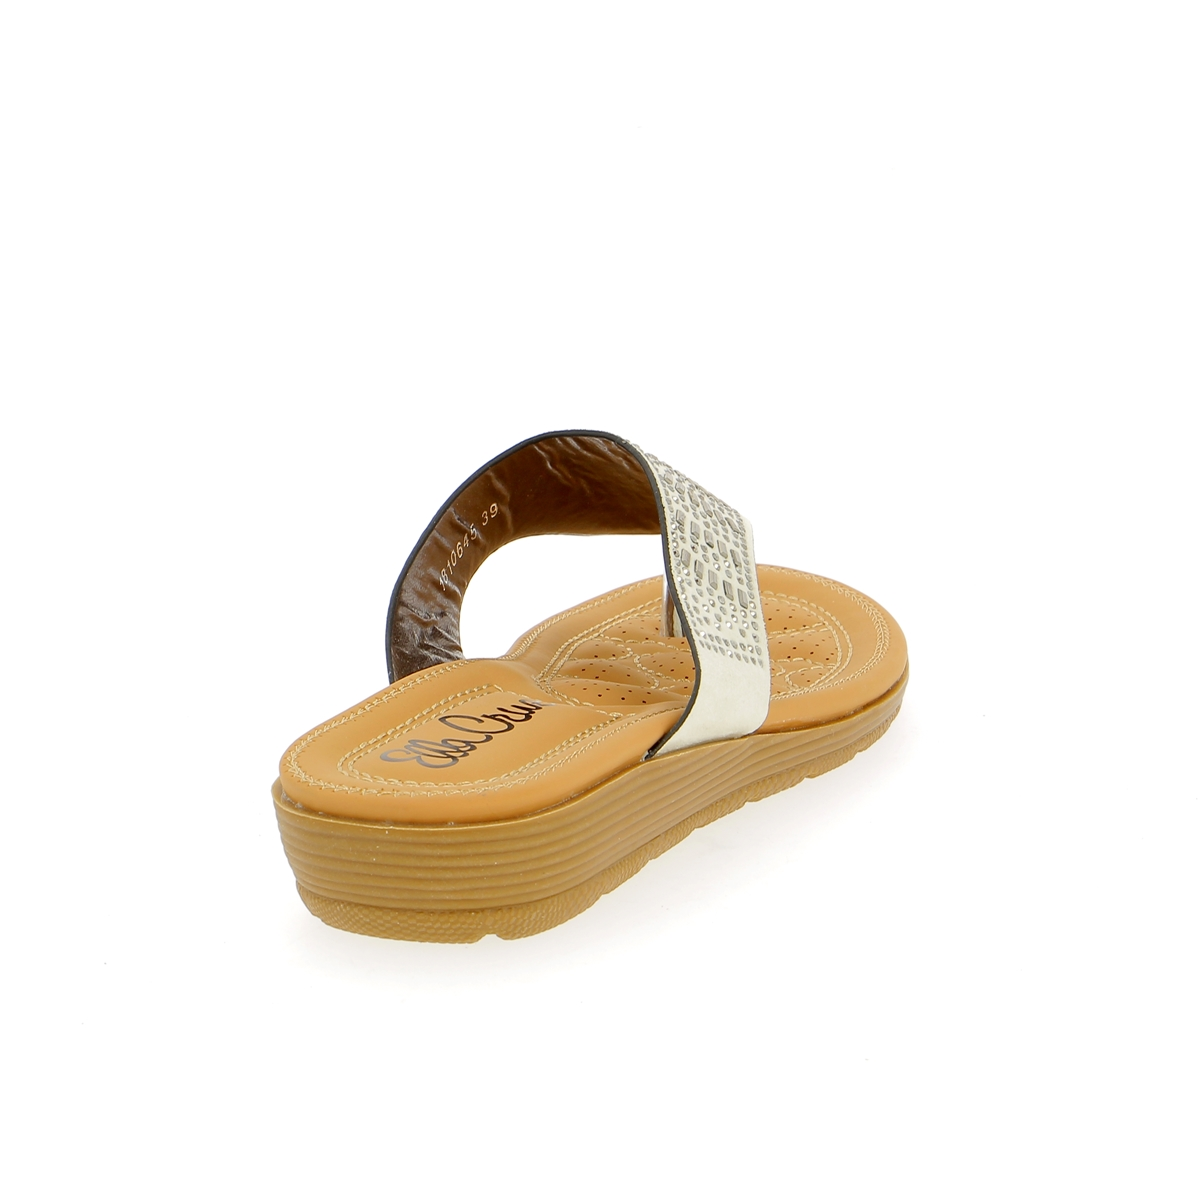 Cypres Muiltjes - slippers beige